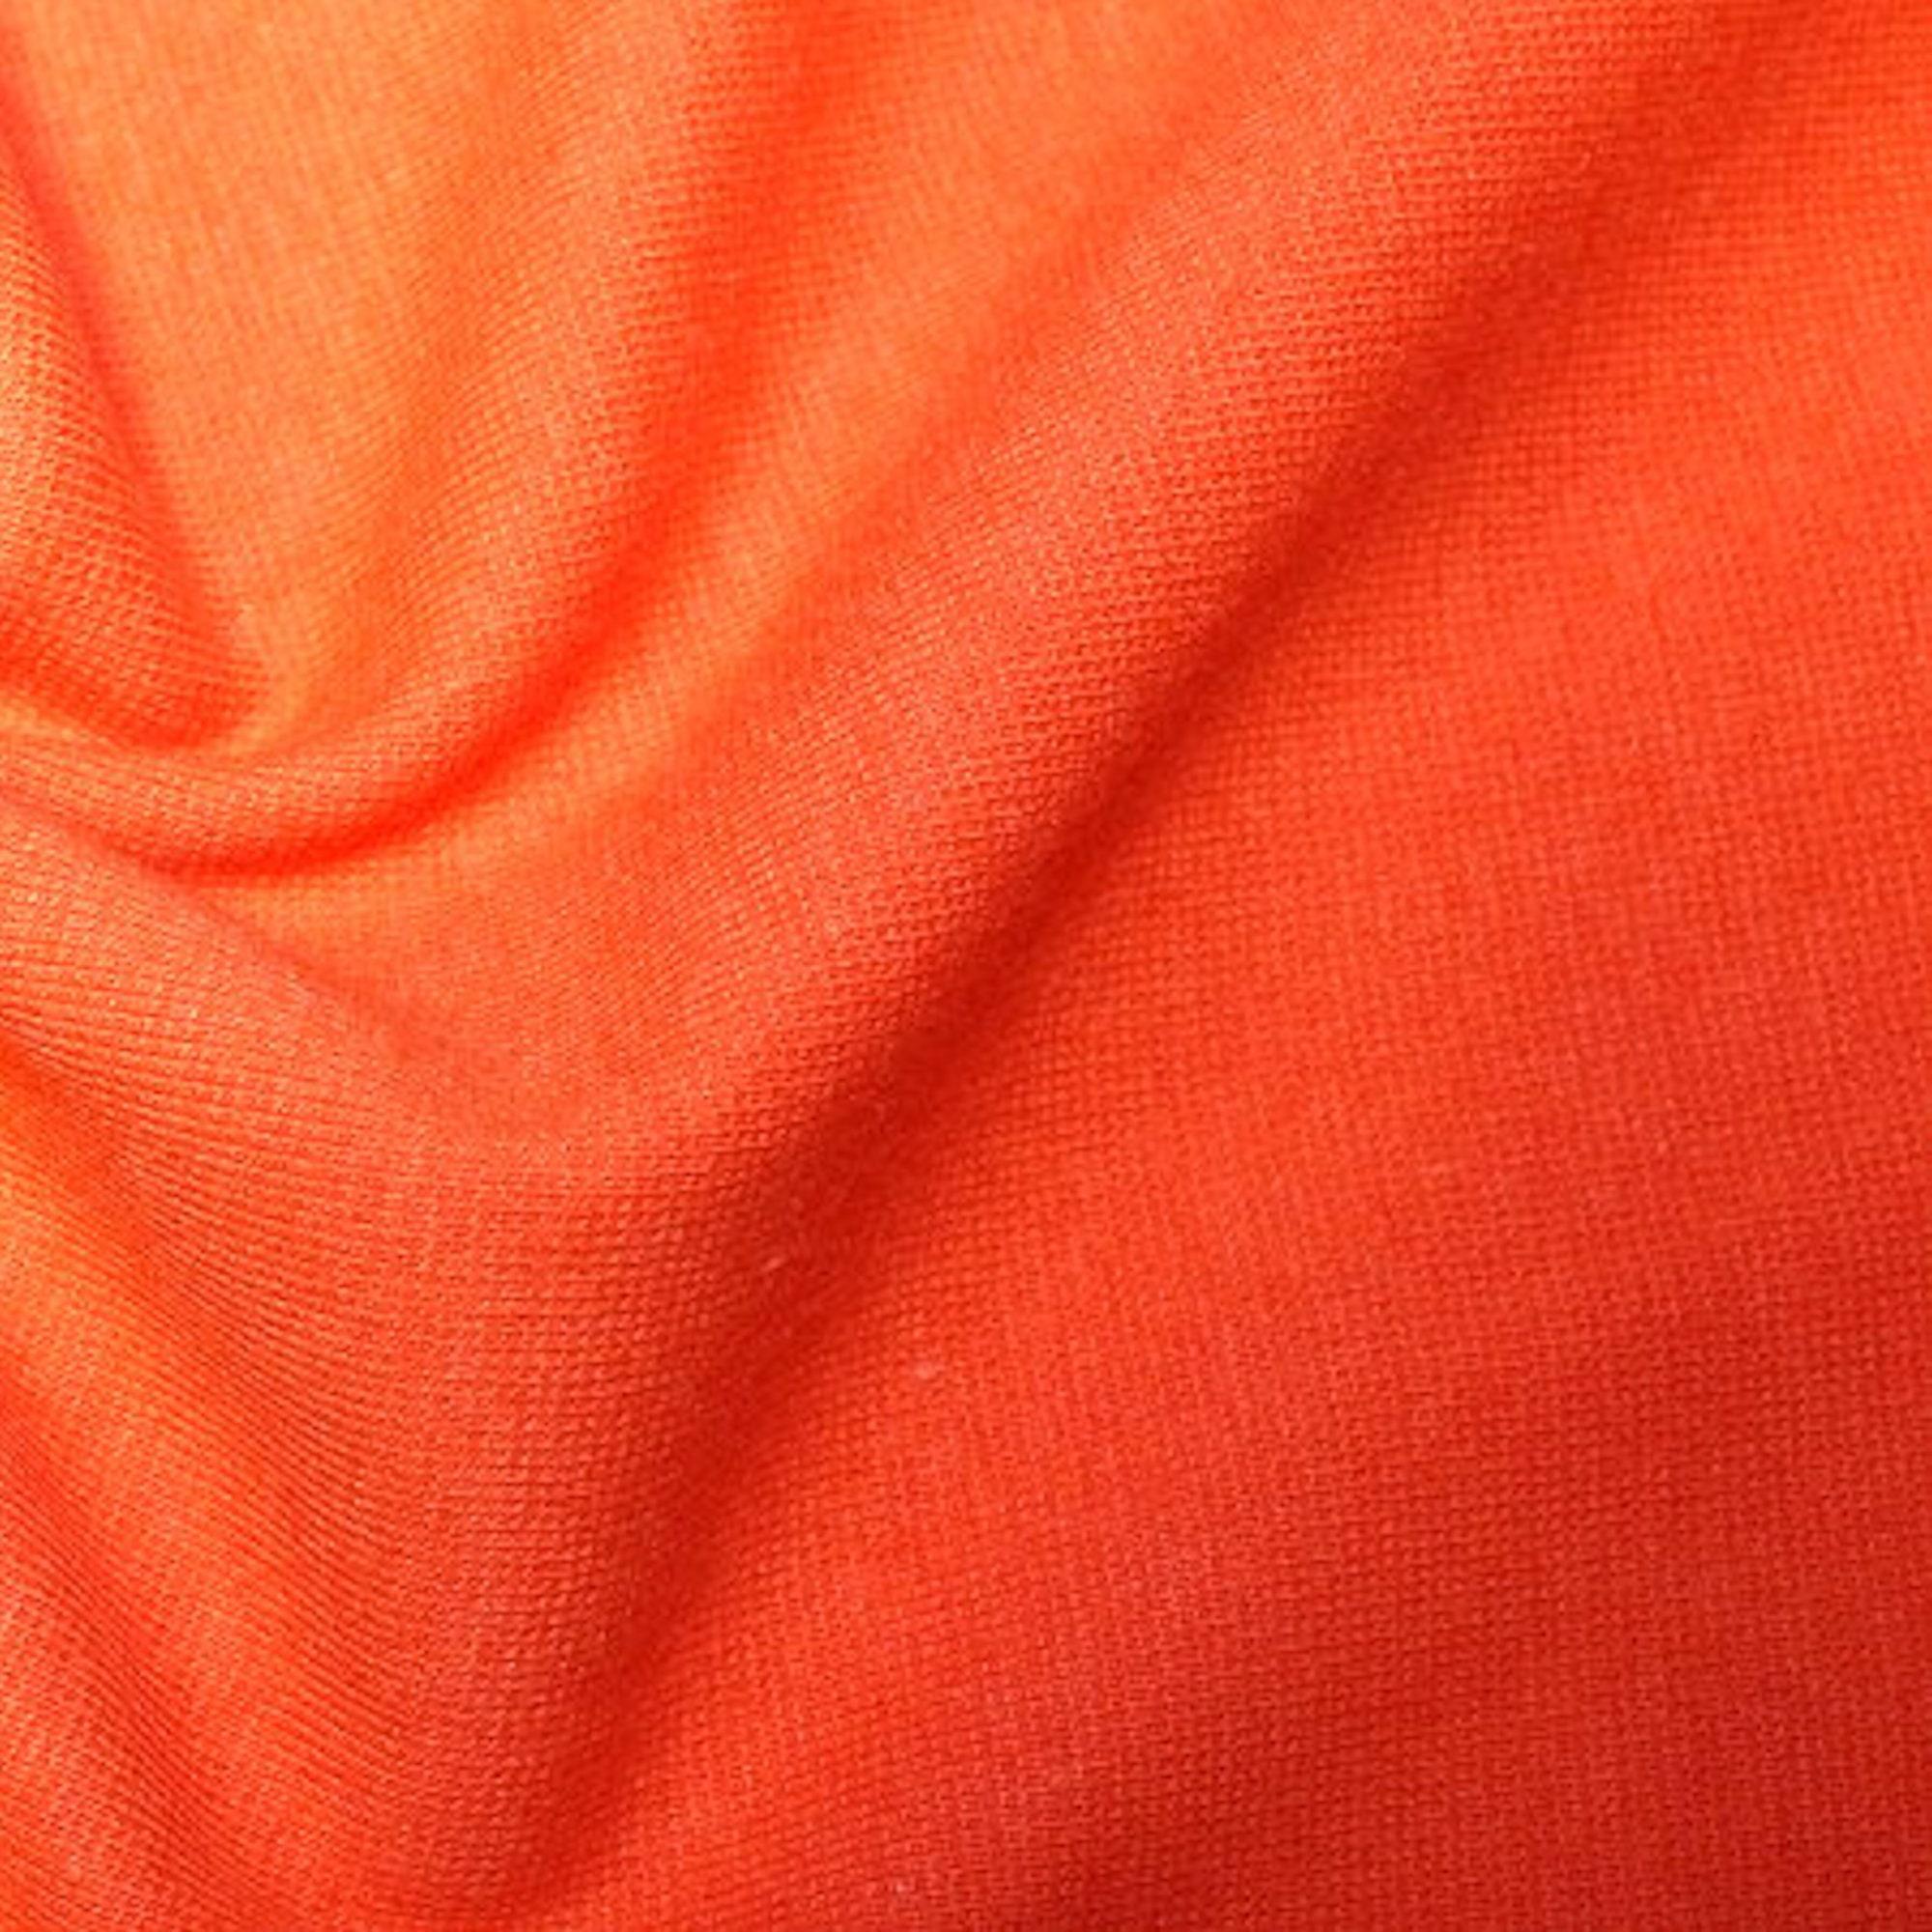 4baab88b6c Orange - Stretch Cotton Tube Tubing Fabric Material - 37cm round (14.5